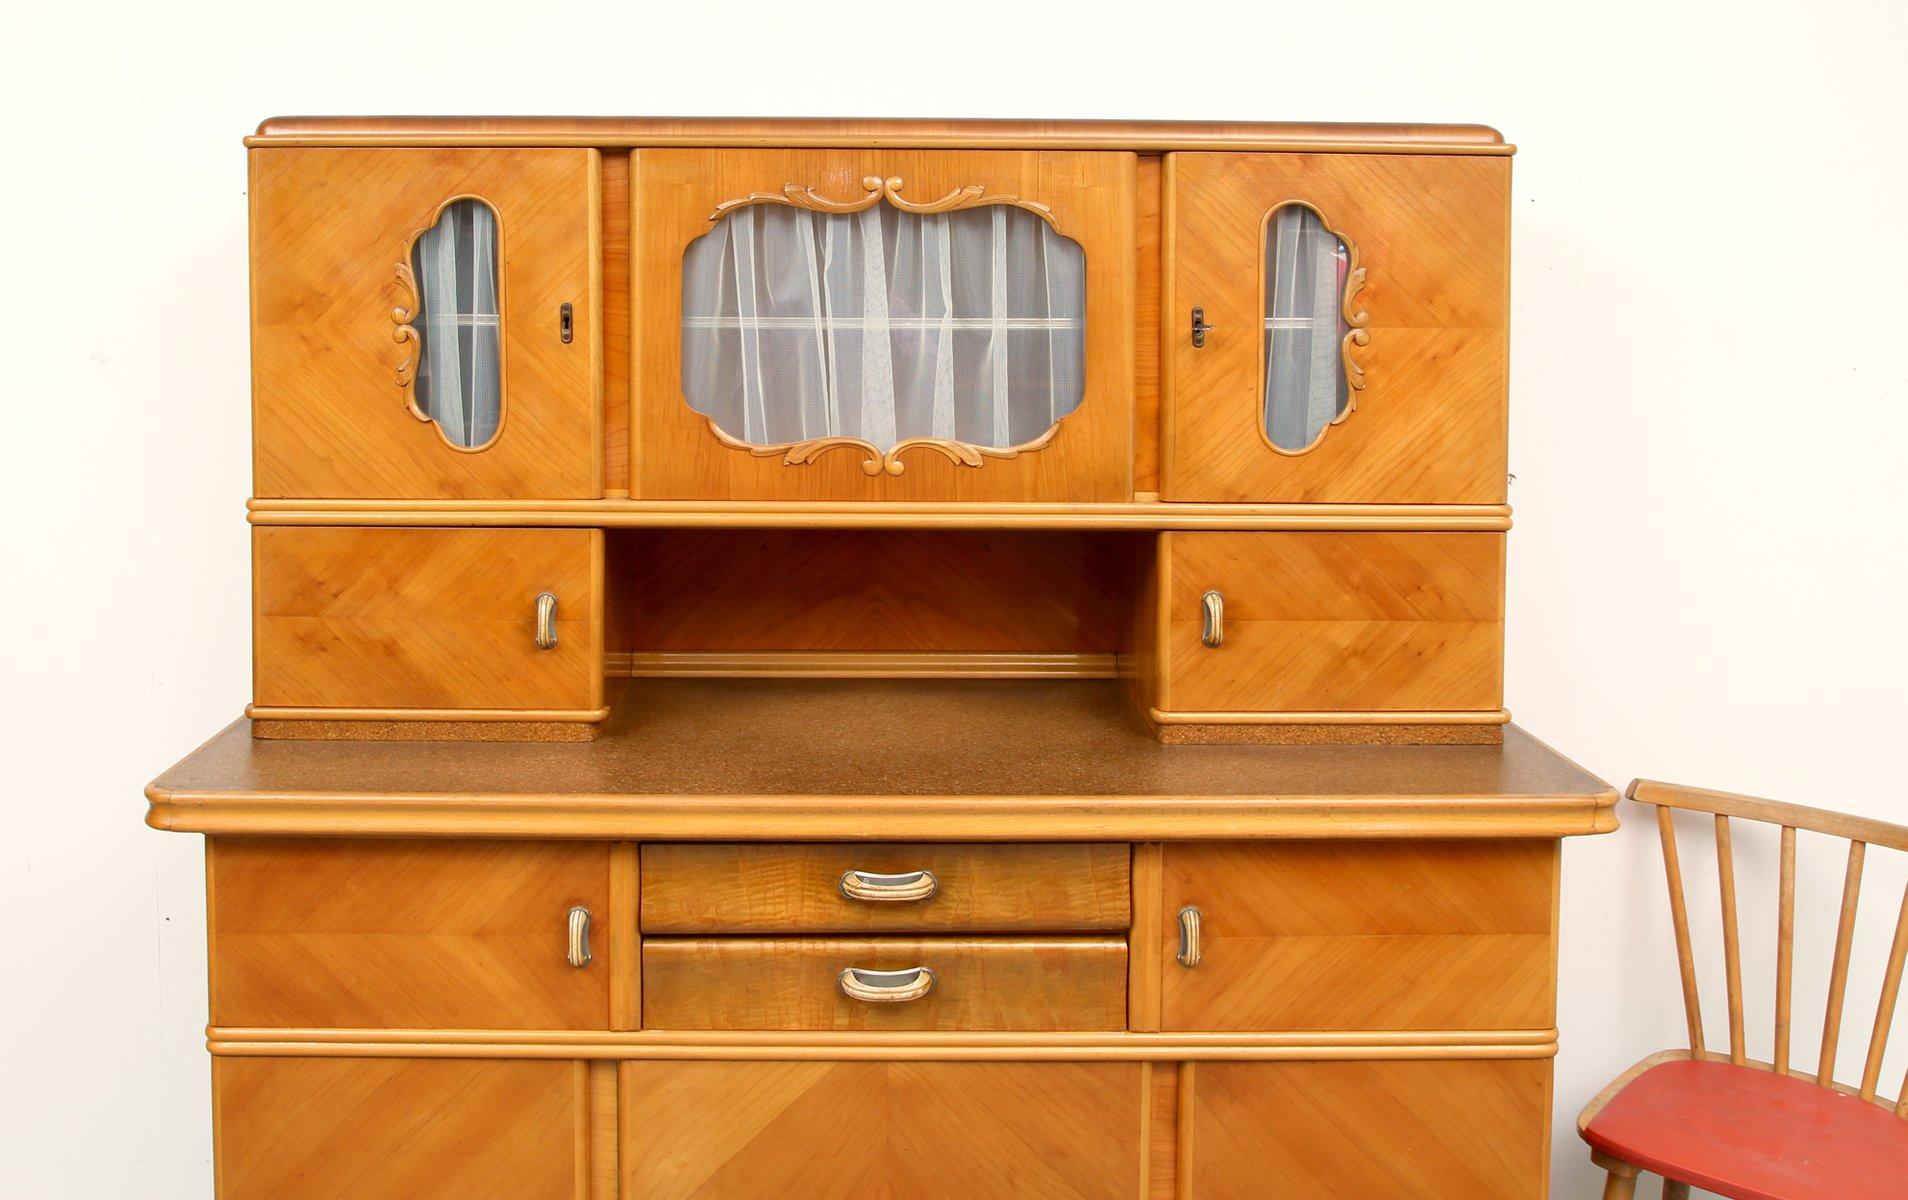 k chen buffet aus holz bei pamono kaufen. Black Bedroom Furniture Sets. Home Design Ideas